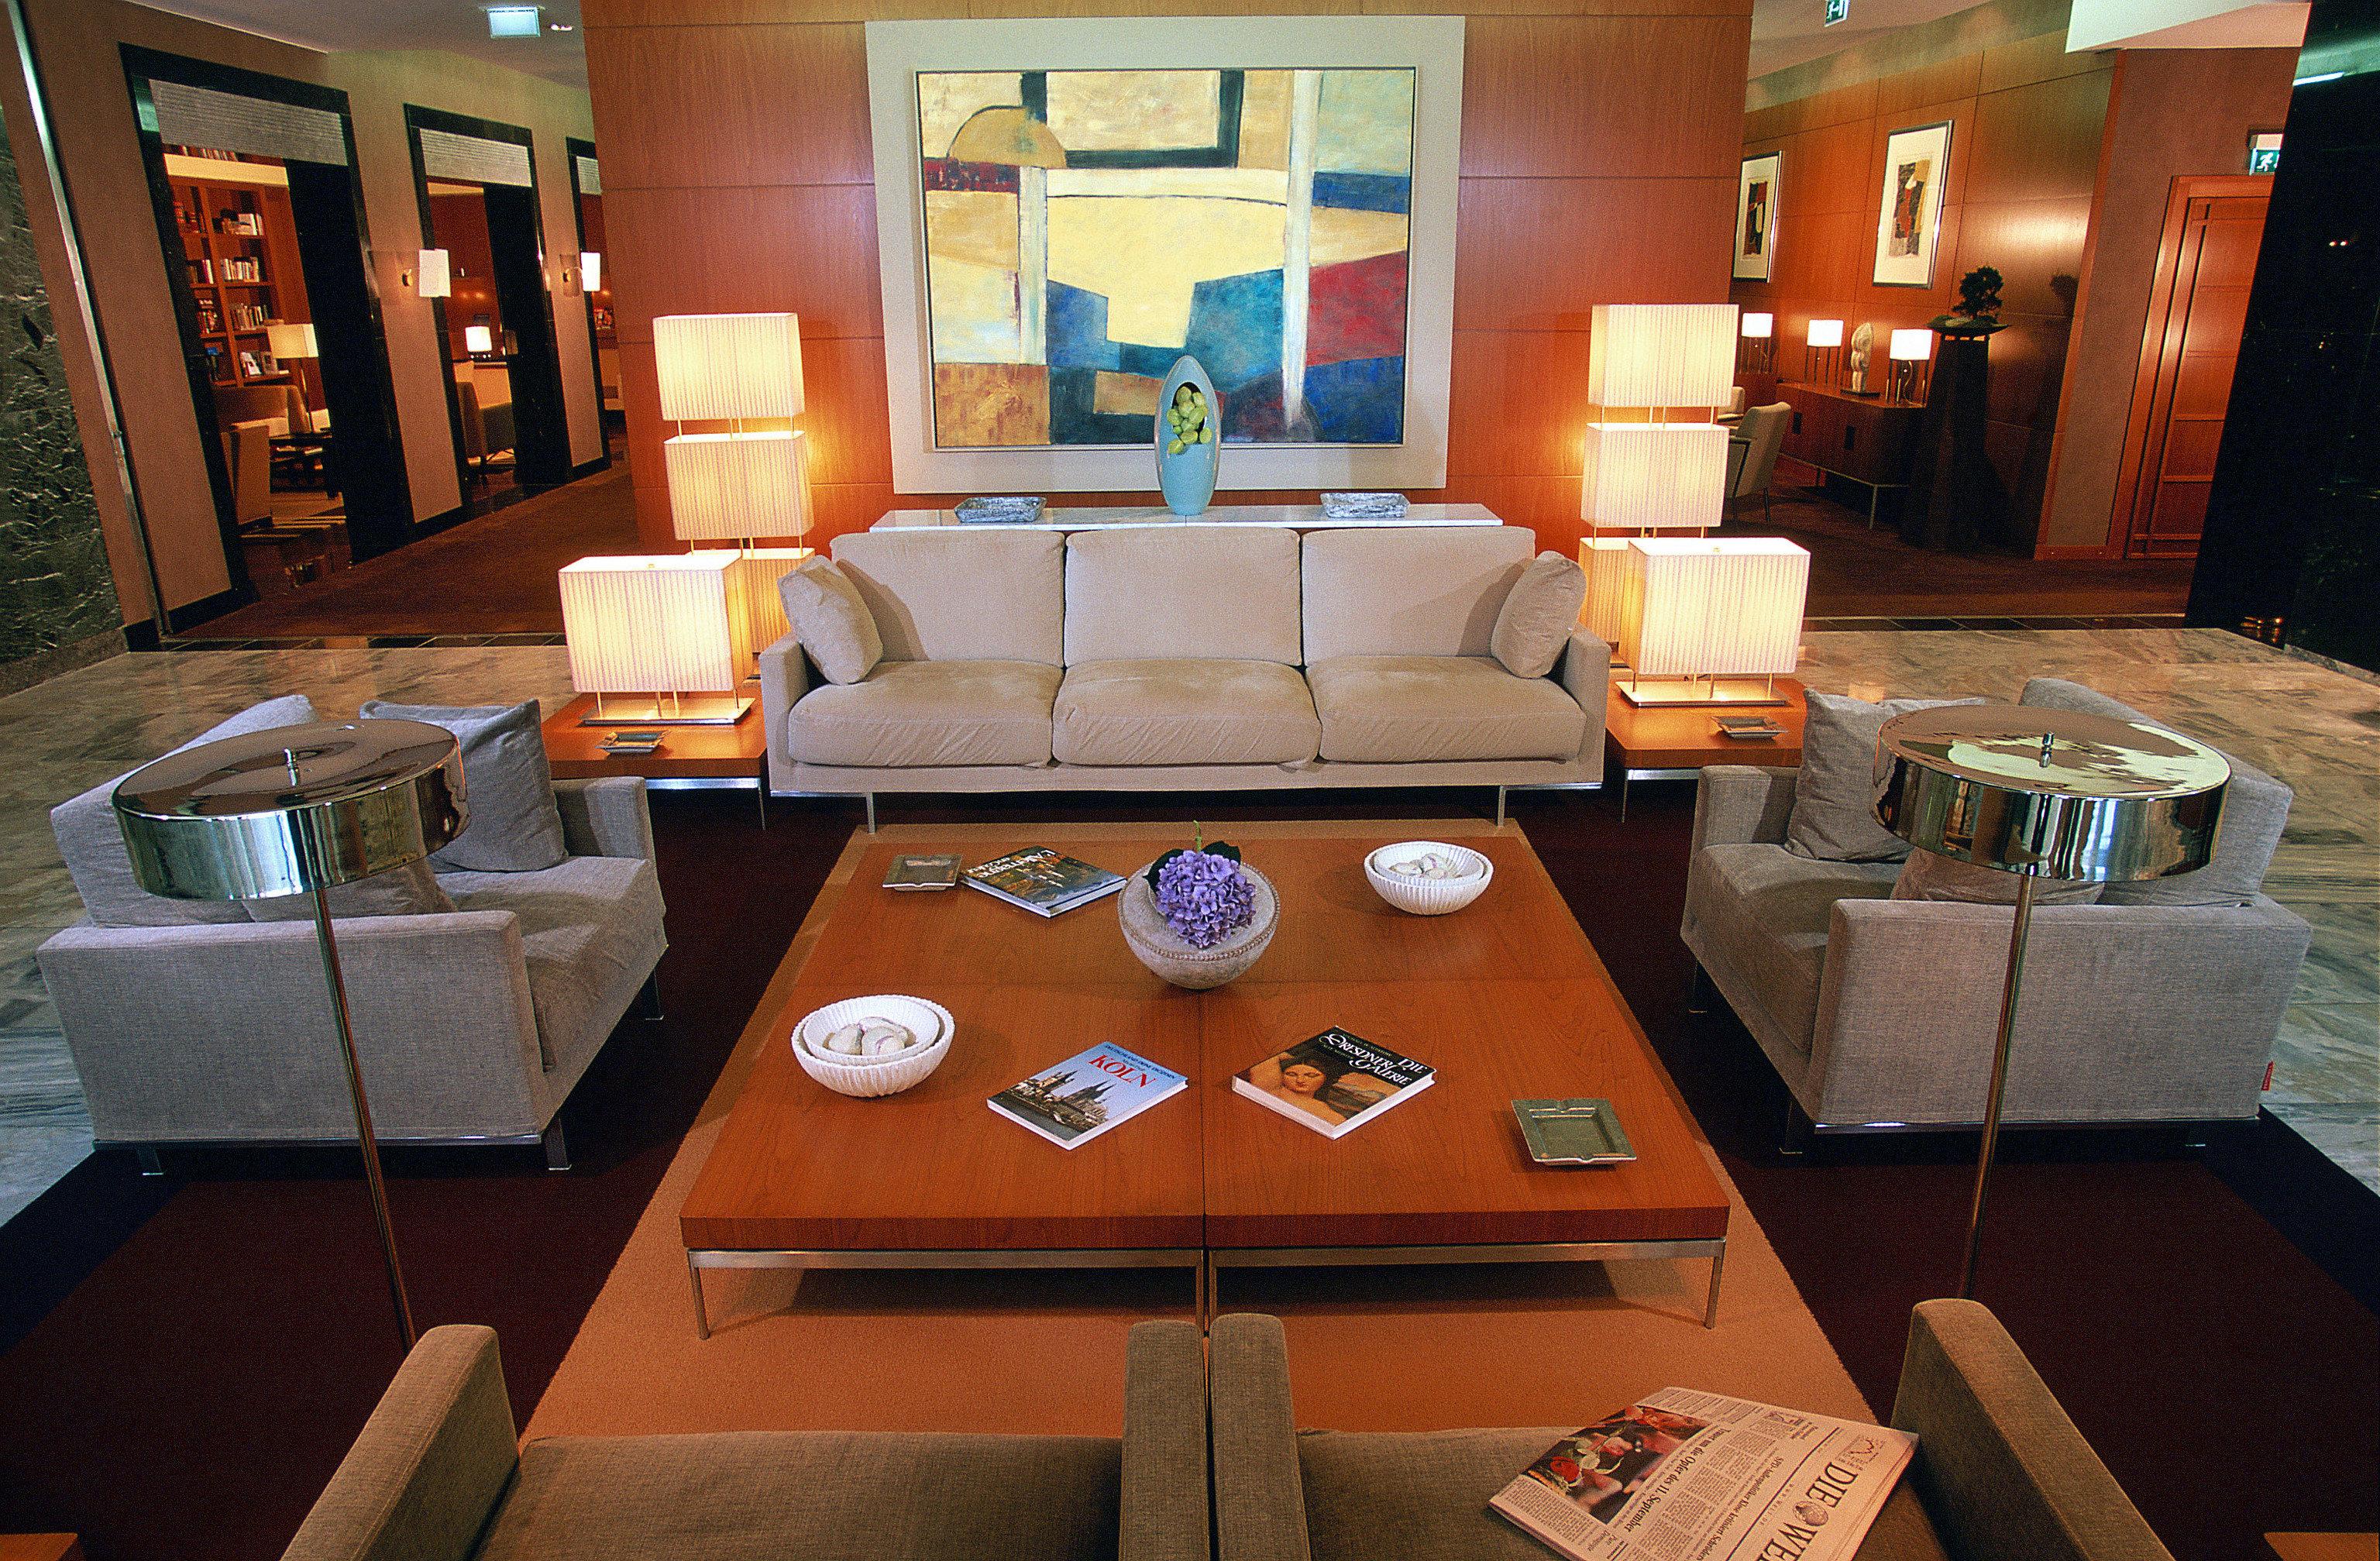 living room recreation room home Lobby screenshot tourist attraction